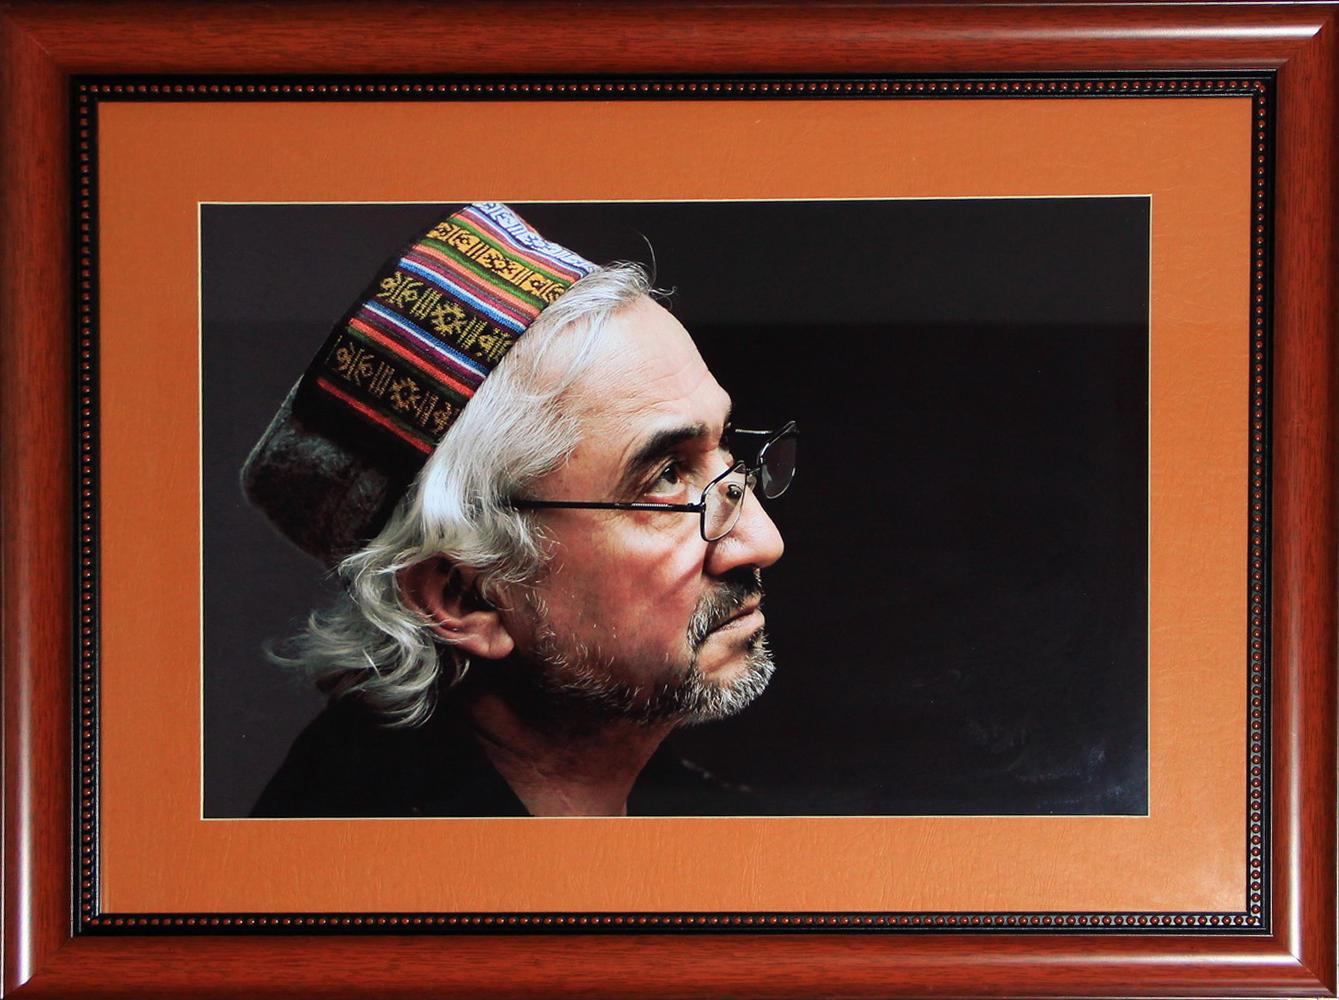 Зуфар Рузикулов. Портрет мастера. Рустам Шарипов